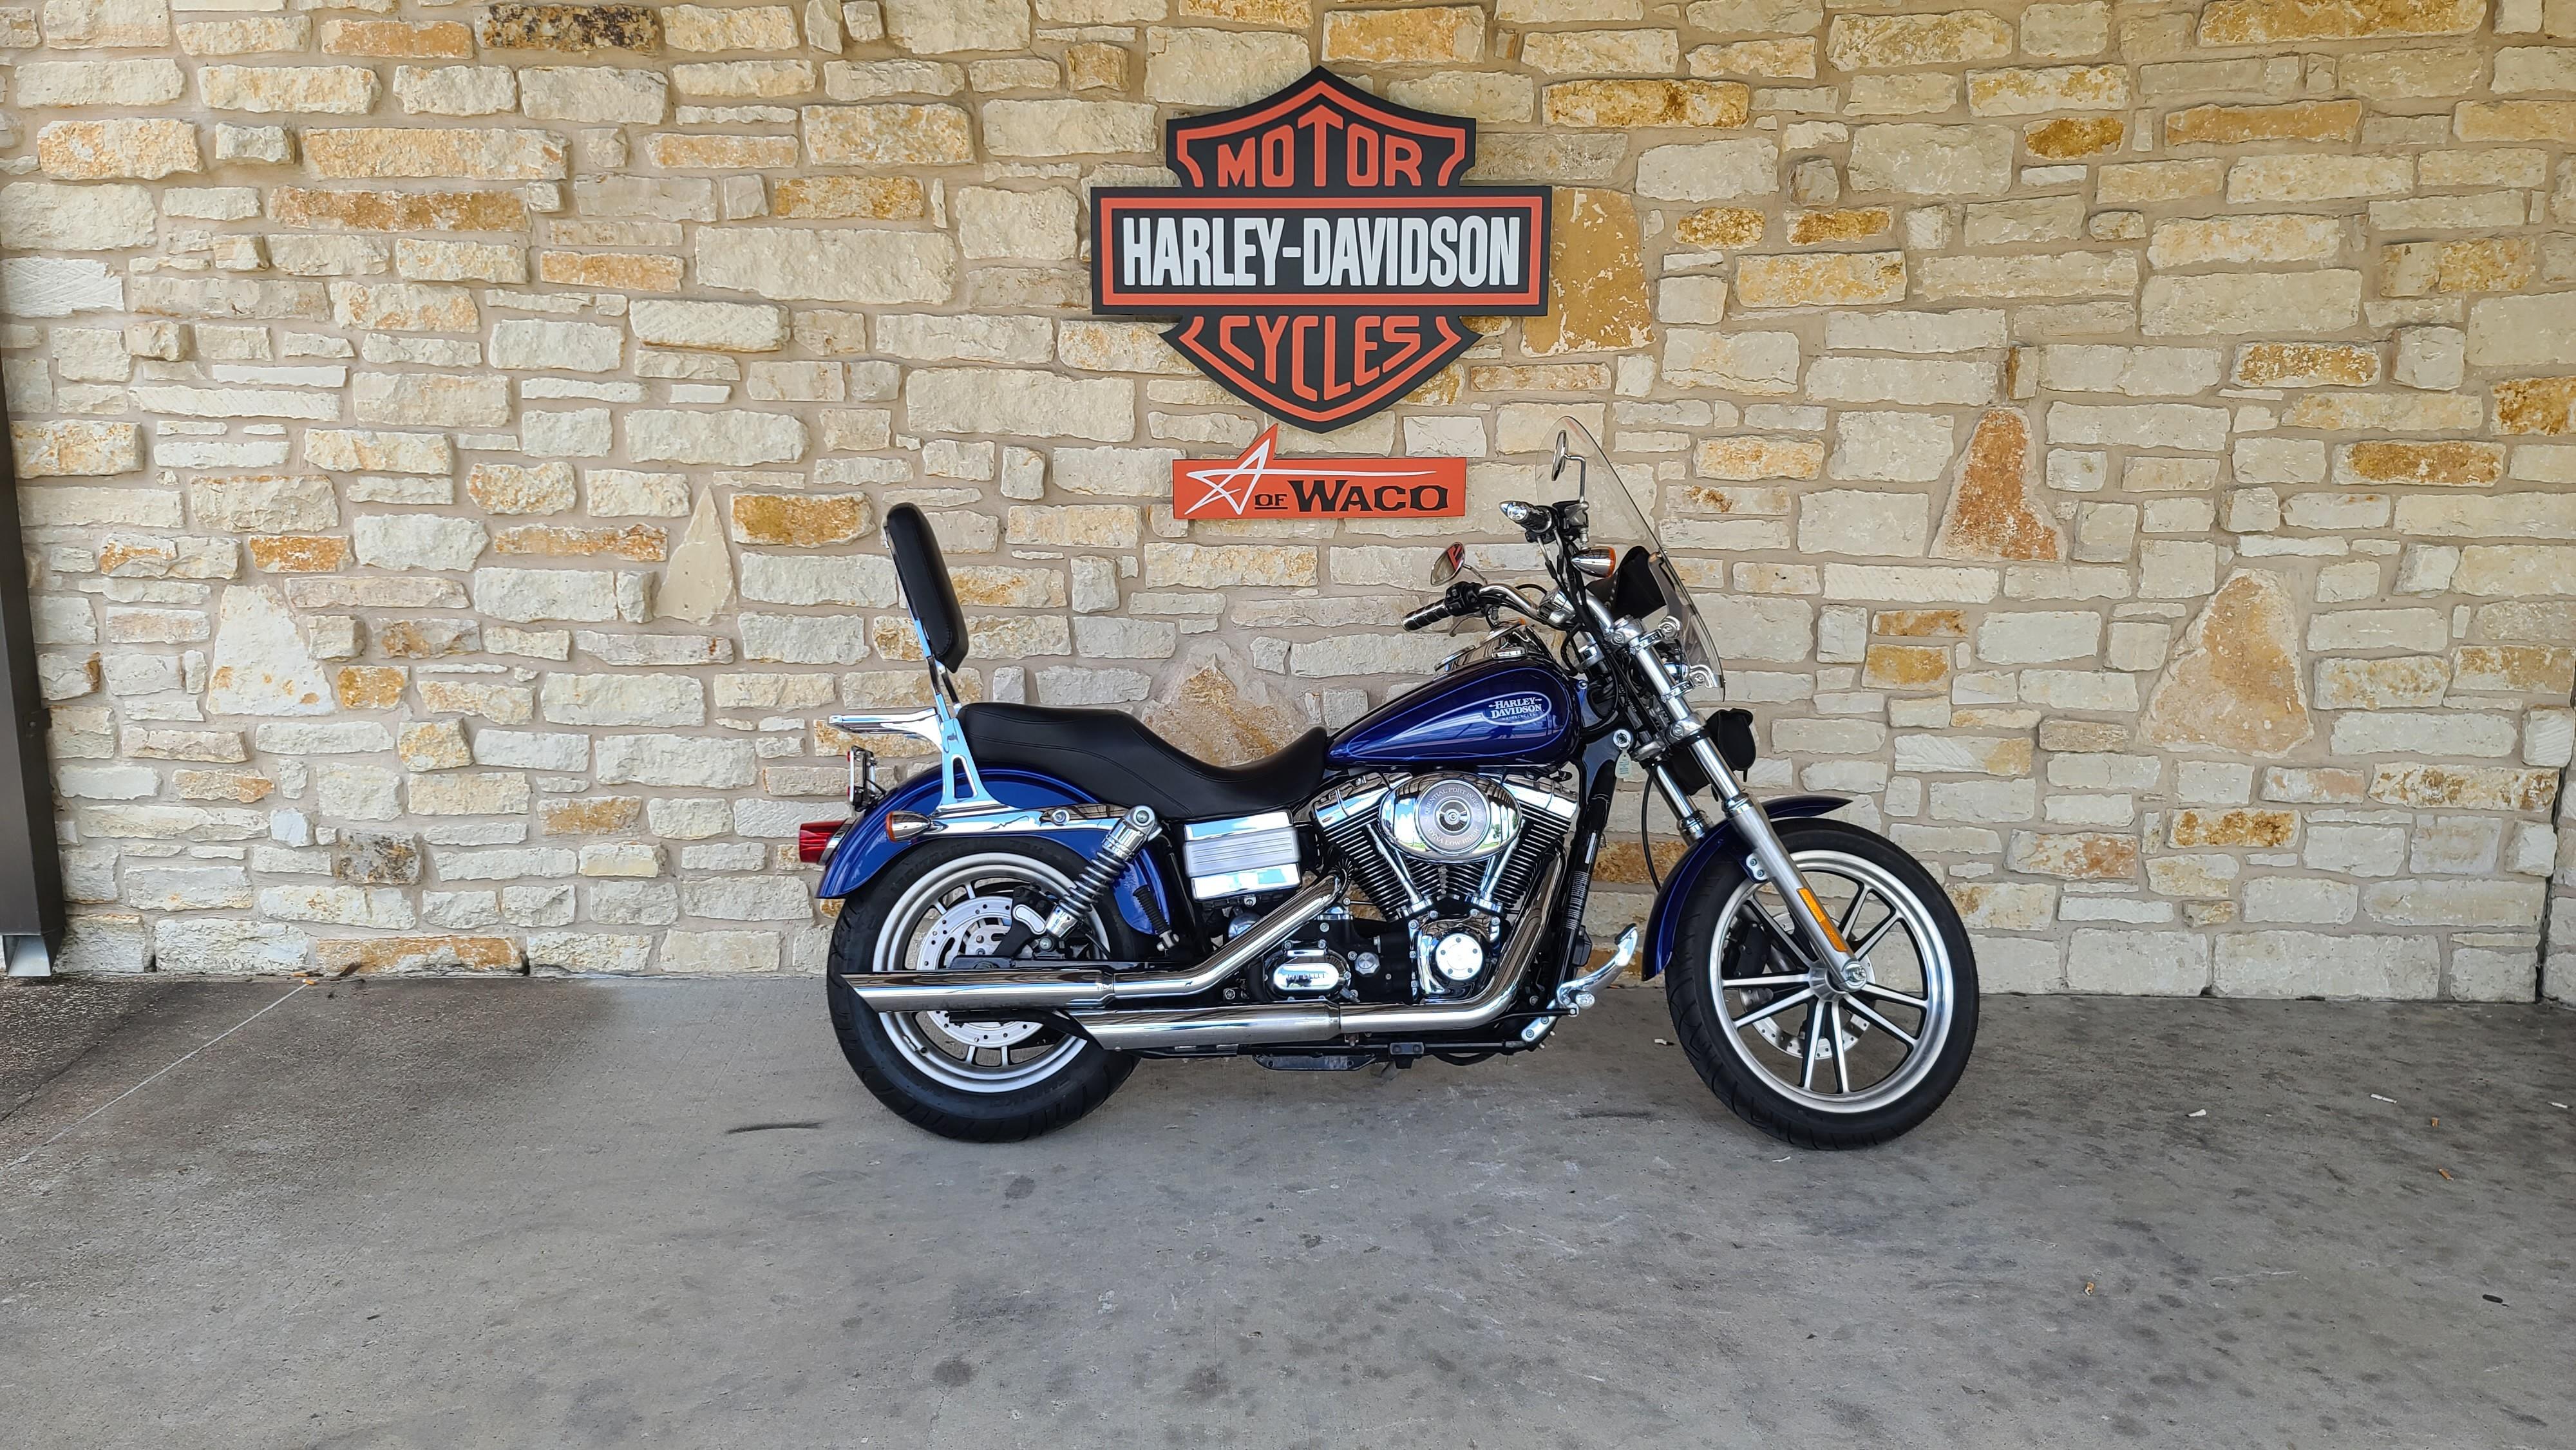 2006 Harley-Davidson Dyna Glide Low Rider at Harley-Davidson of Waco